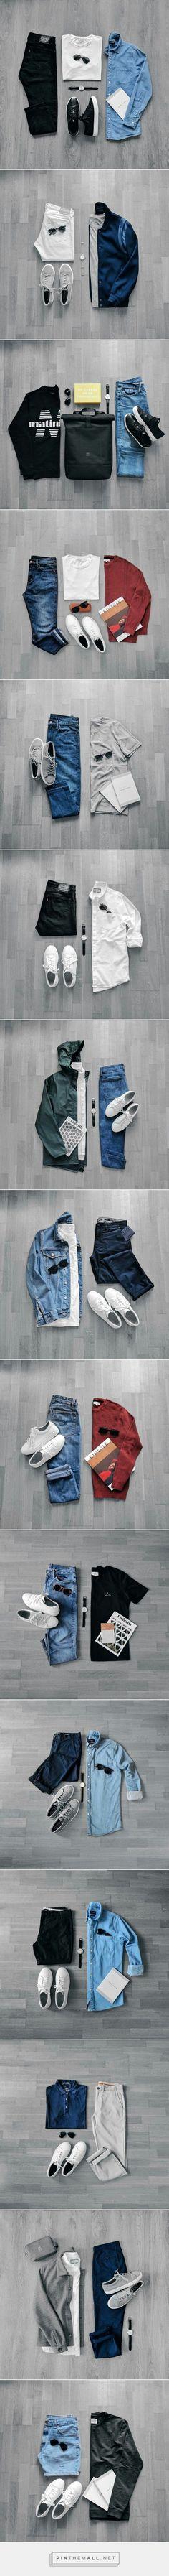 Stunning outfit ideas for men #mensfashion #streetstyle